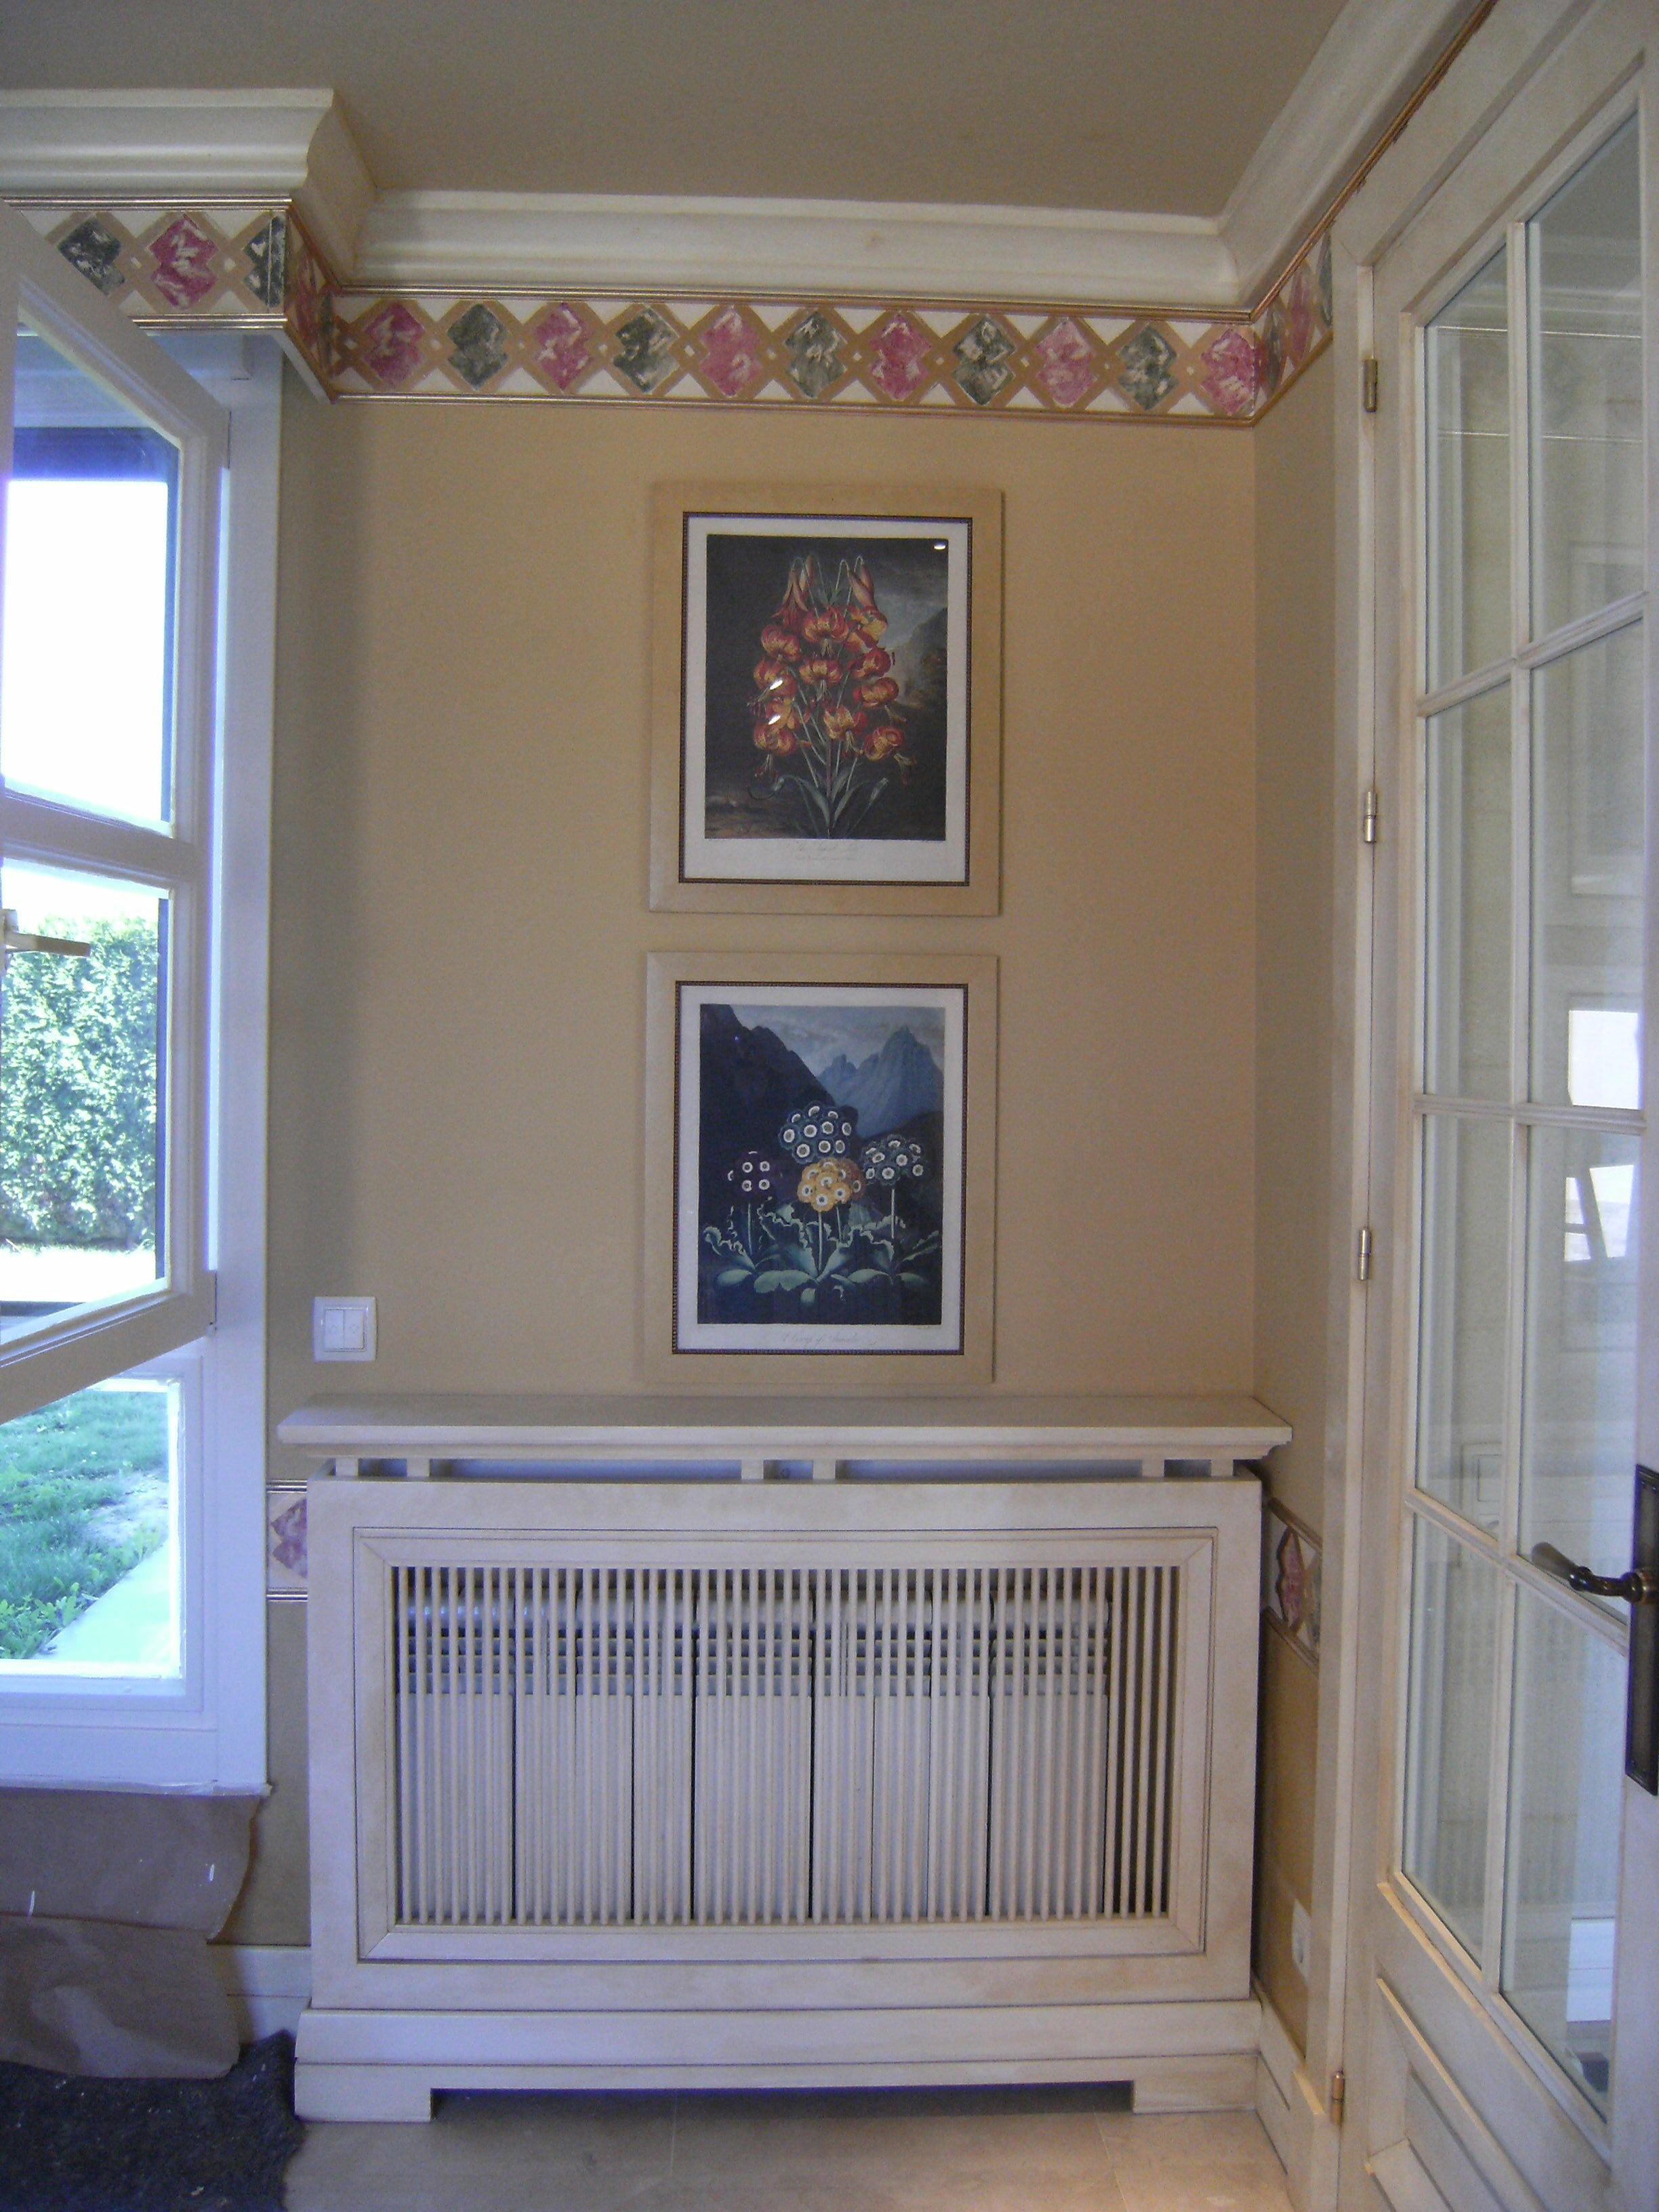 Muebles Oviedo Asturias ~ Obtenga ideas Diseño de muebles para su ...